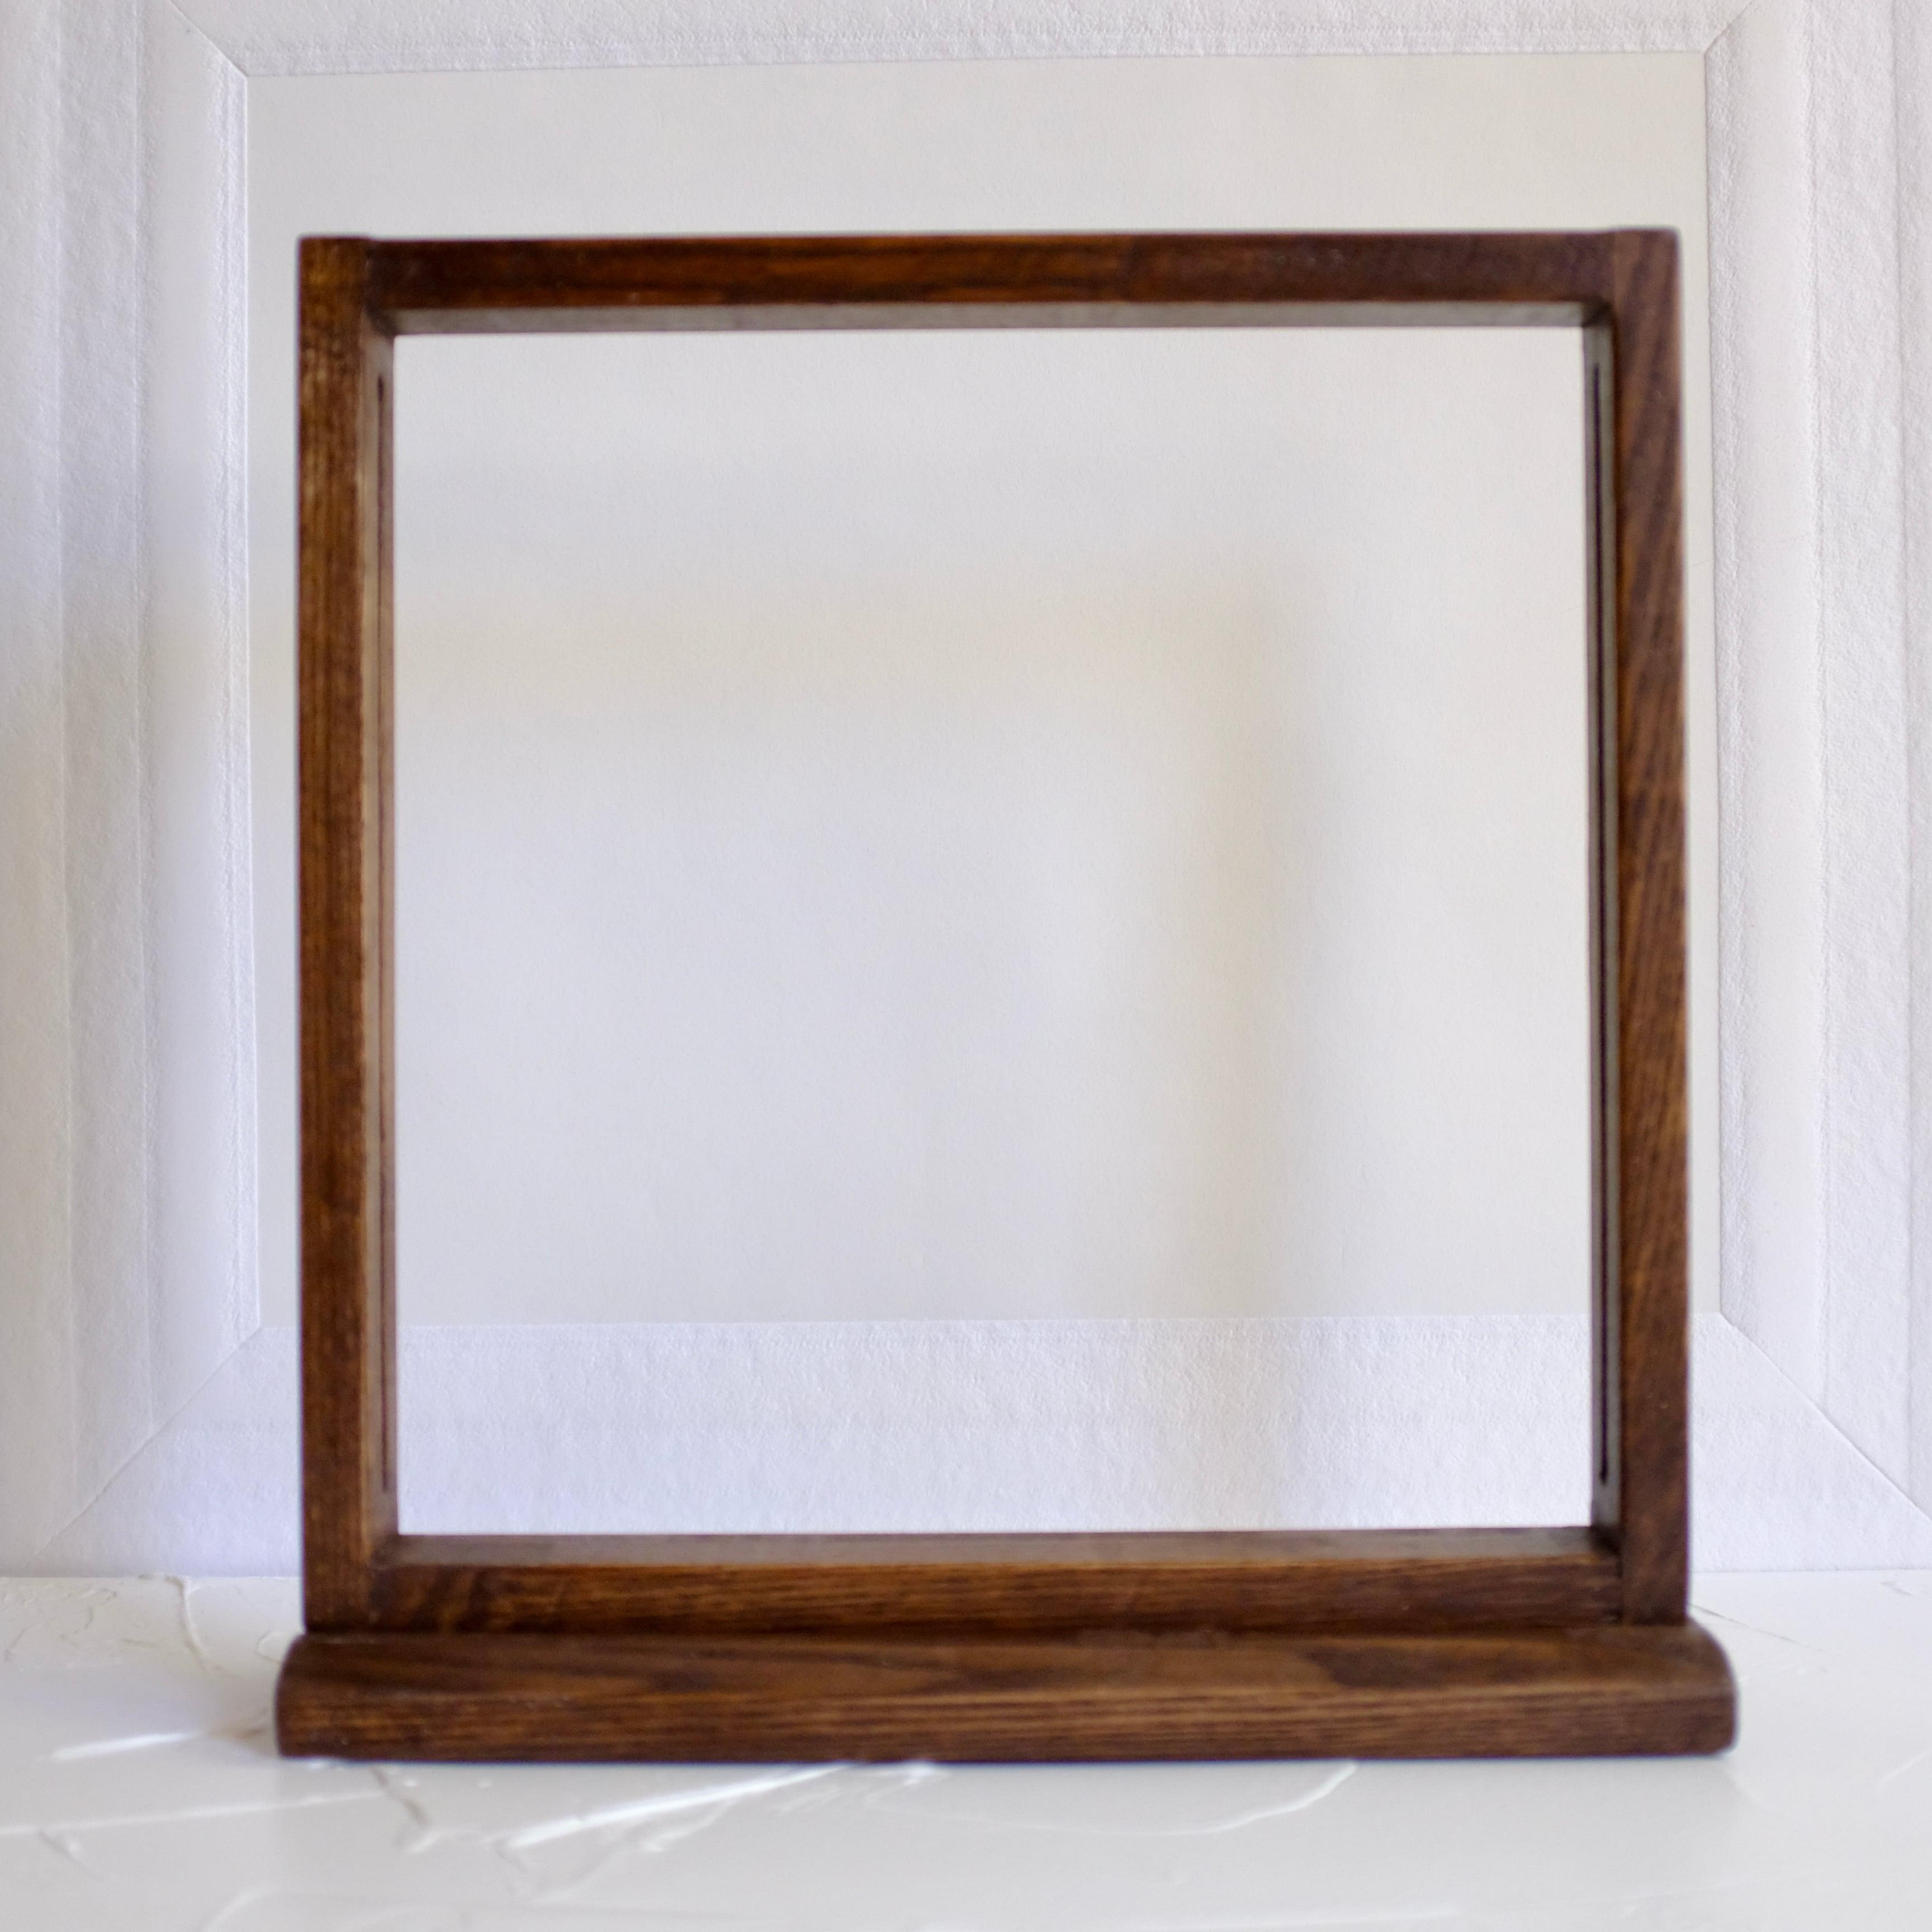 sumika M専用 木枠 ブラウン